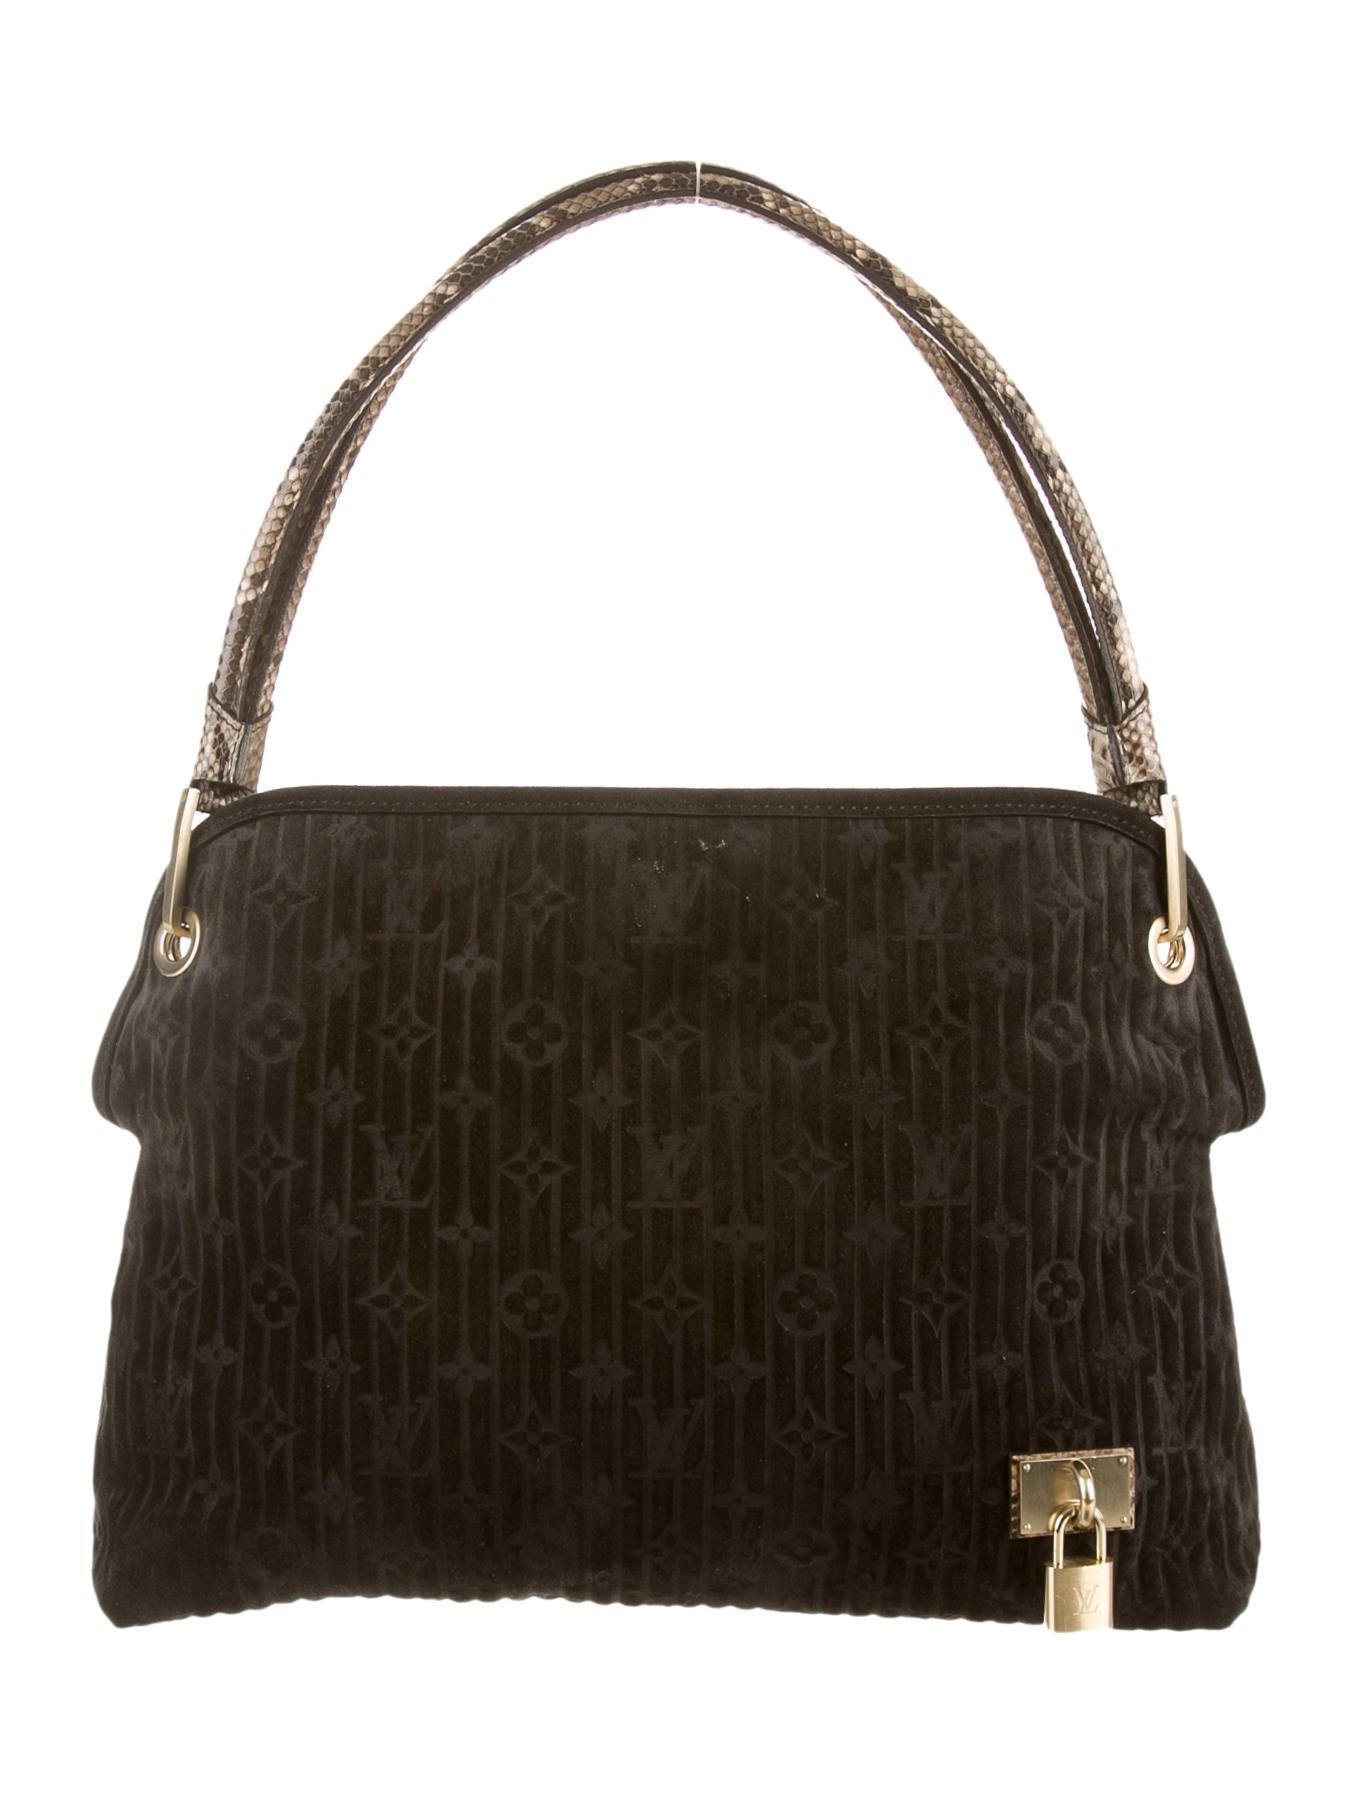 Wonderful Louis Vuitton Womenu0026#39;s New Handbags 2018